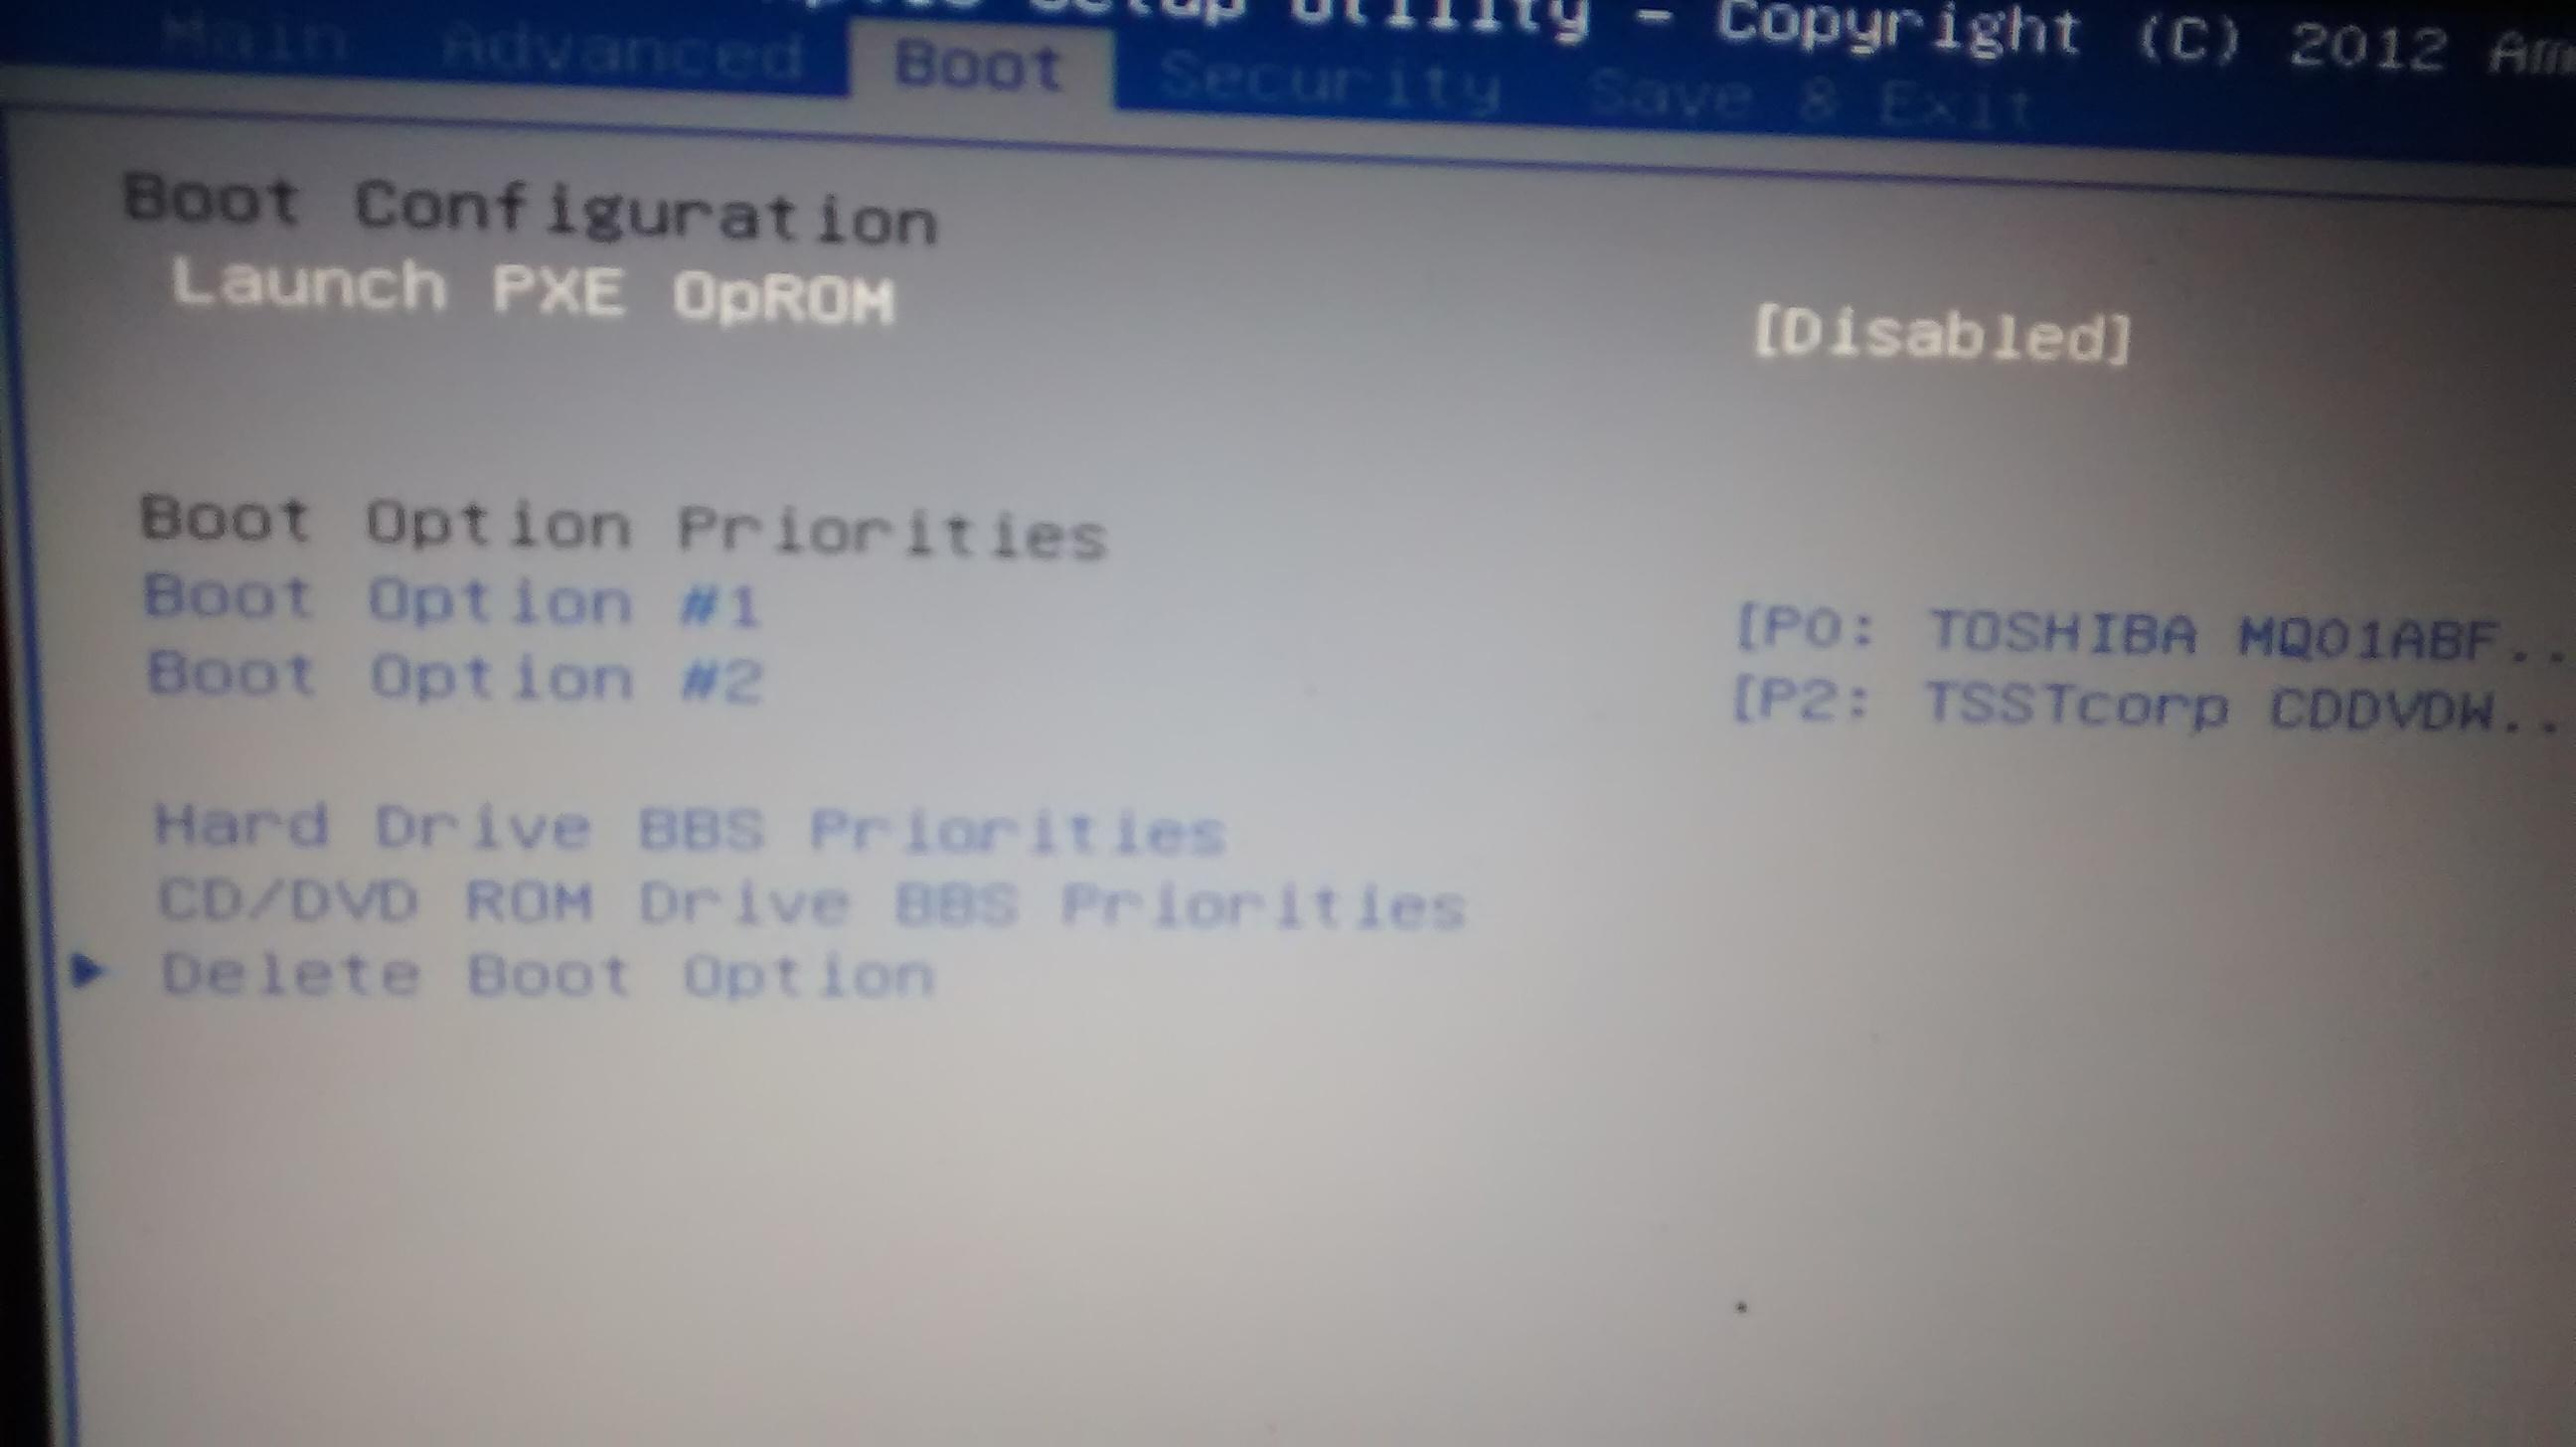 Insydeh20 Setup Utility Hp Usb Boot